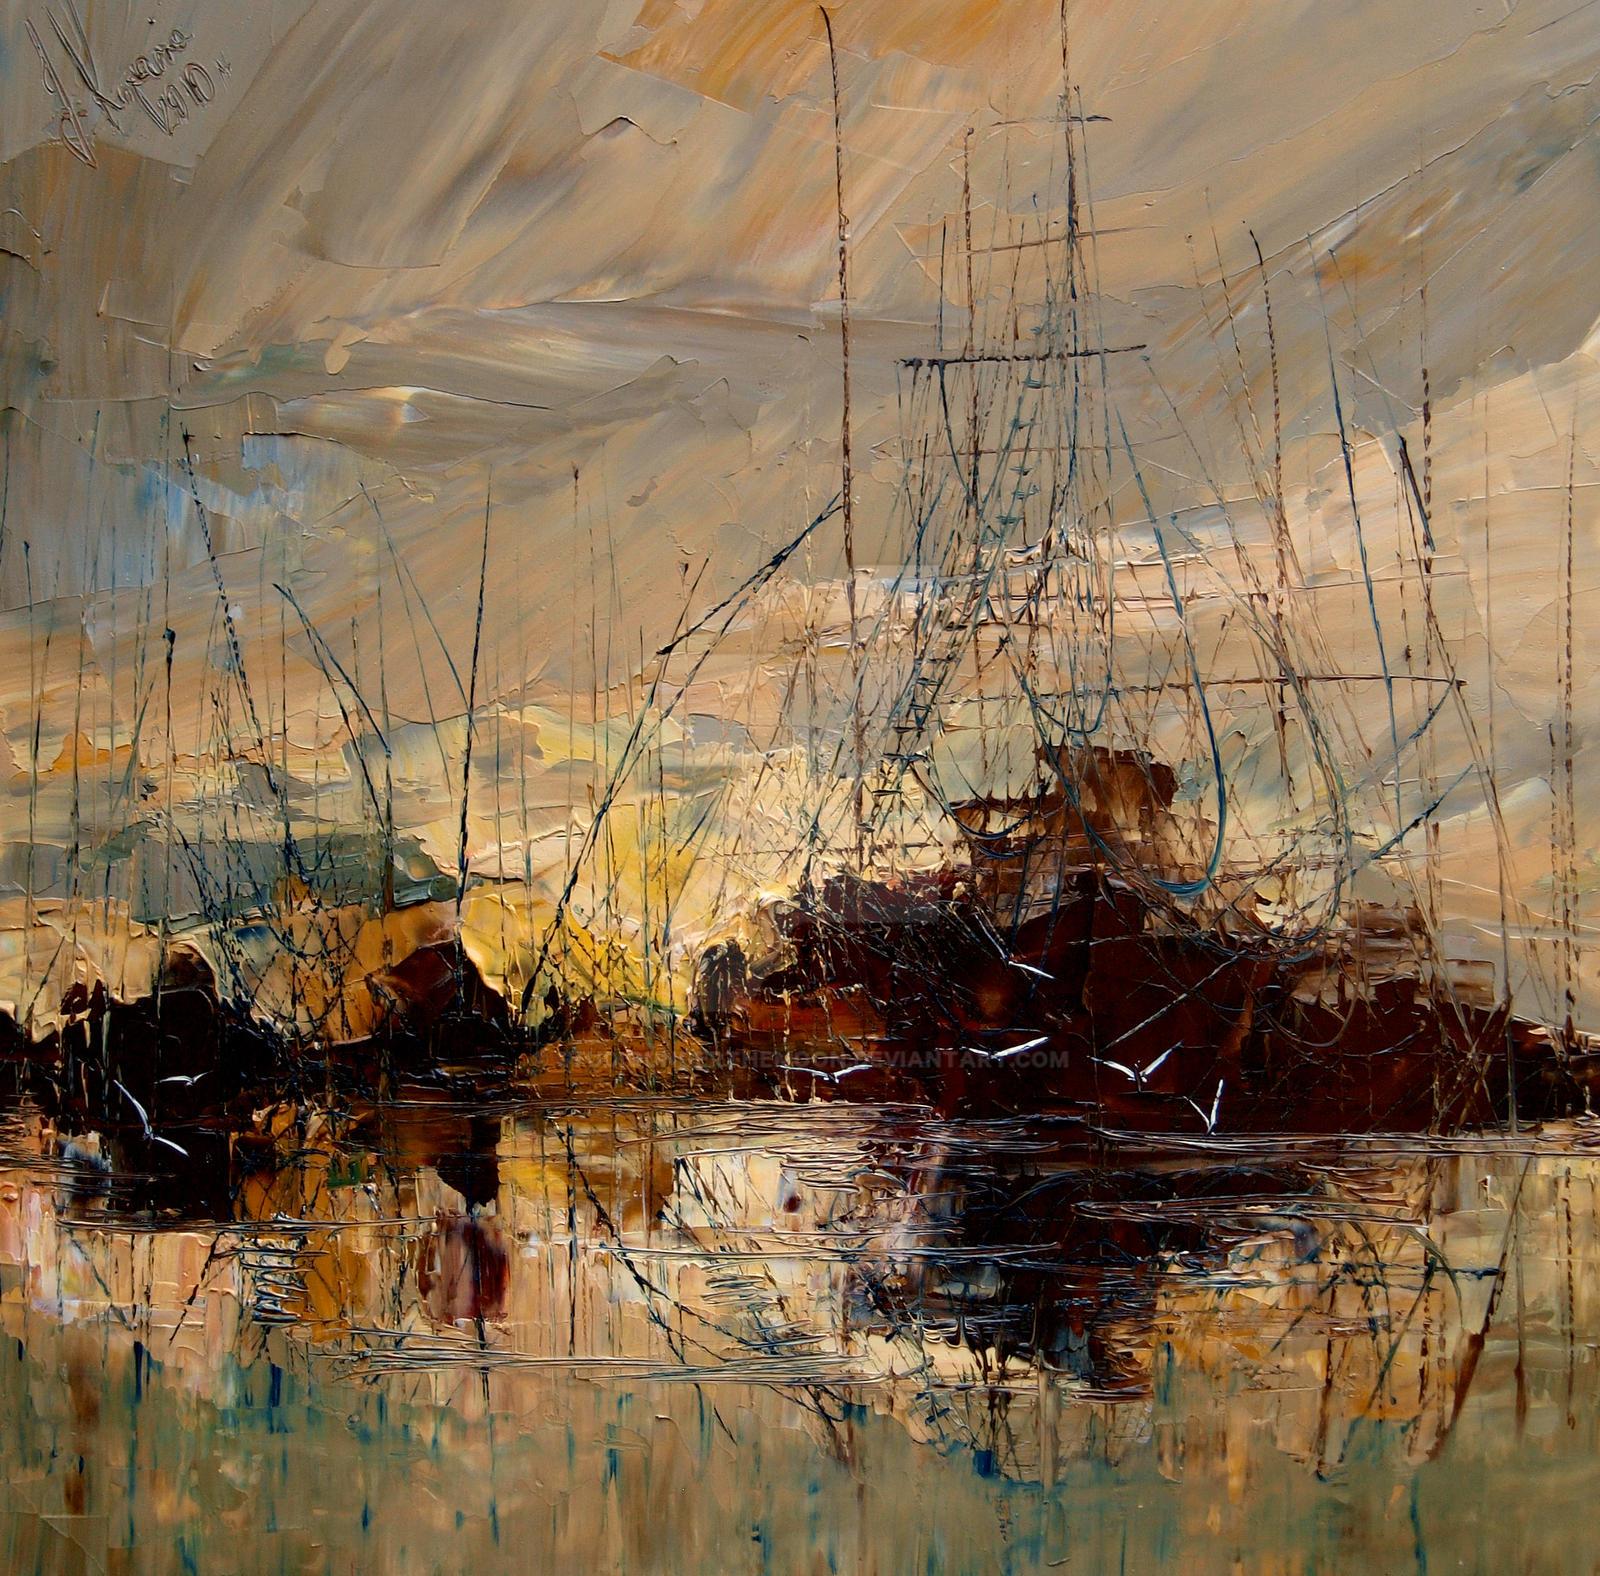 Harbor by StudioUndertheMoon